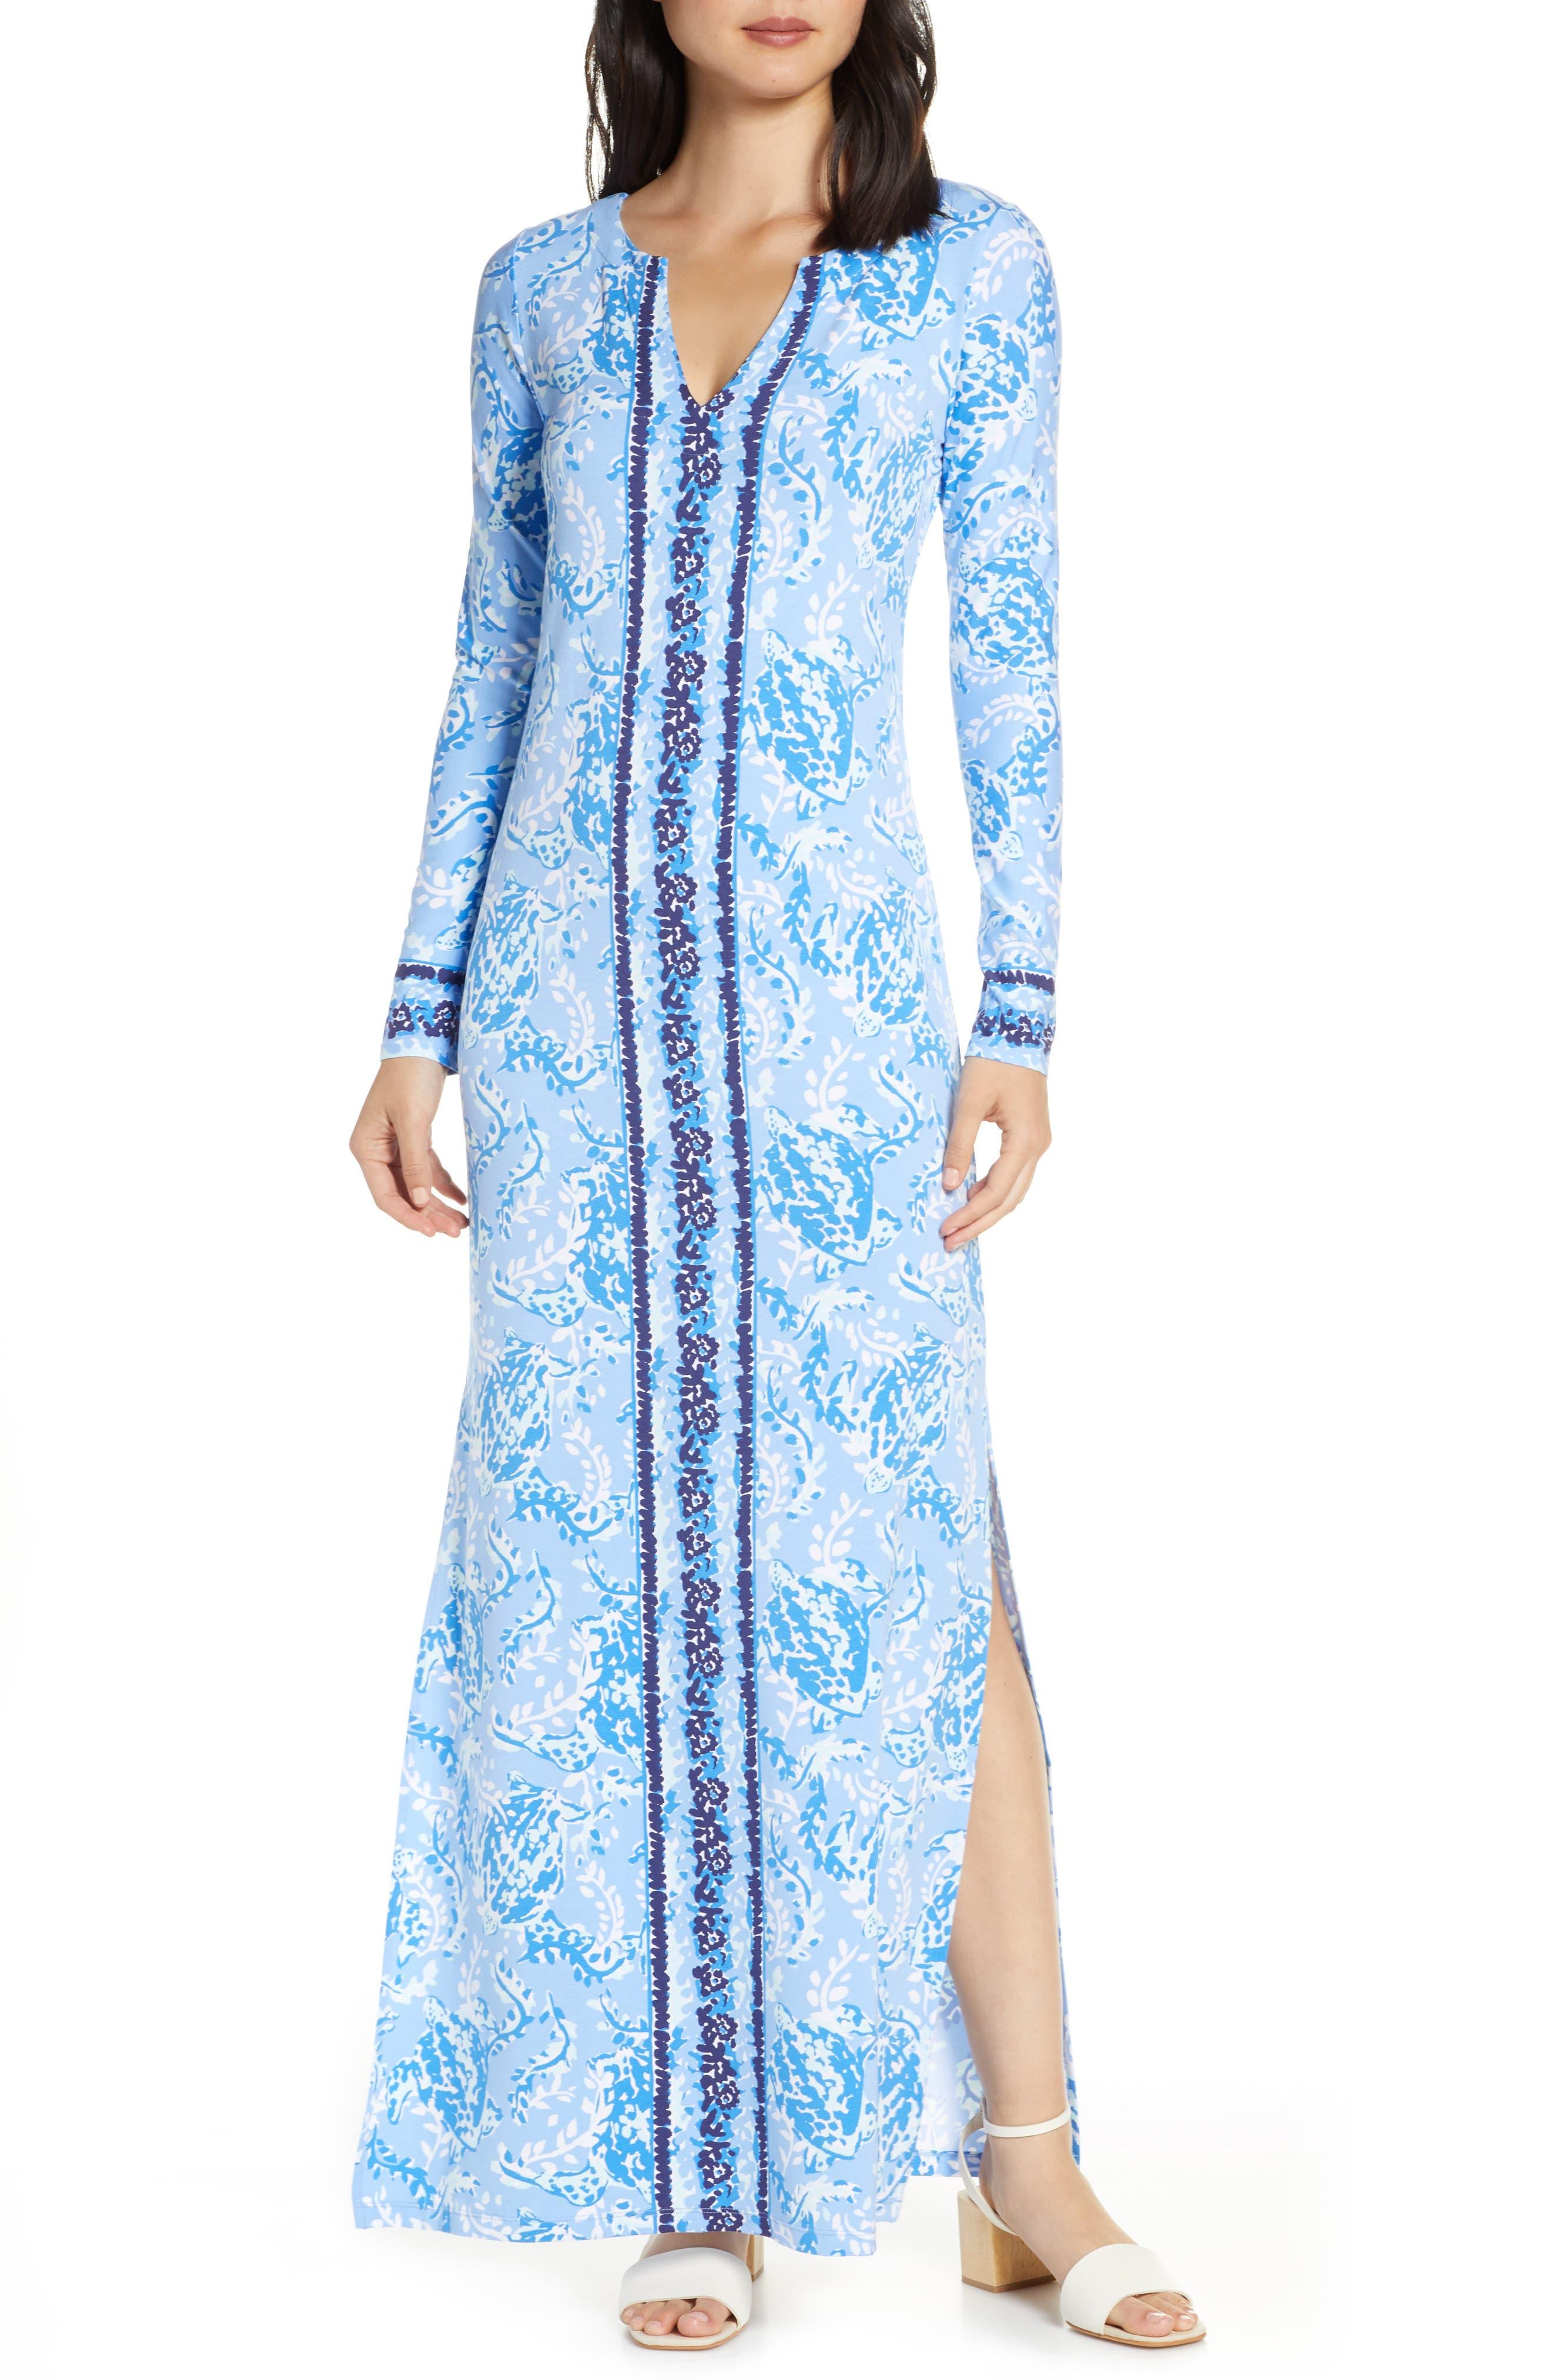 Lilly Pulitzer Faye Long Sleeve Upf 50+ Maxi Dress, Blue